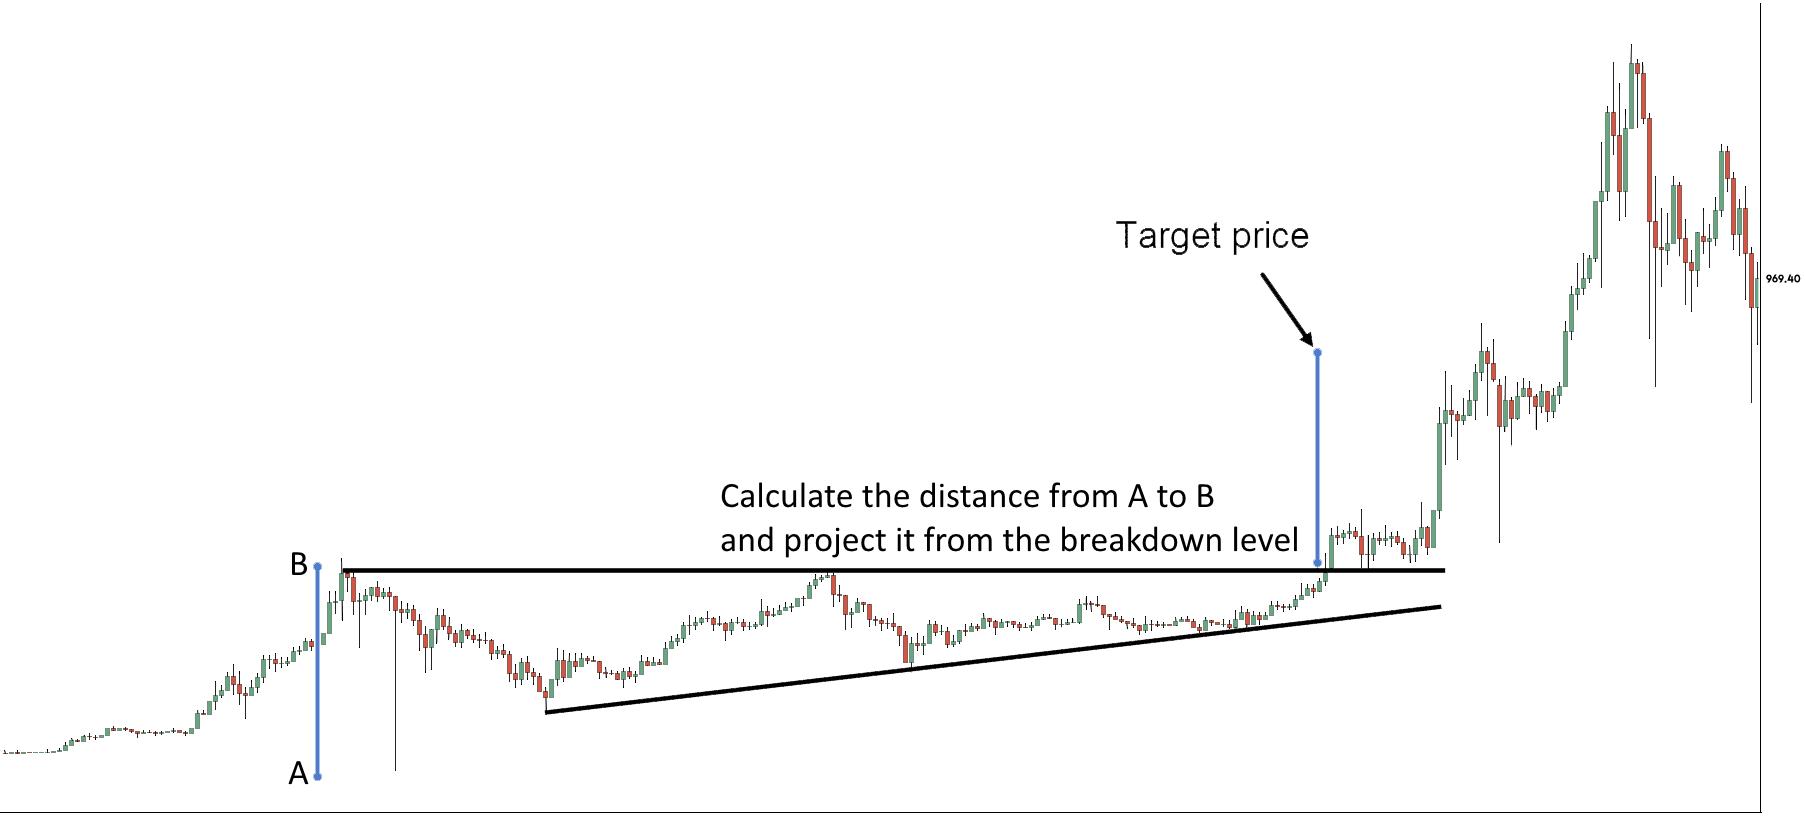 Ascending Triangle Pattern Chart Sample 7 - Finance Brokerage